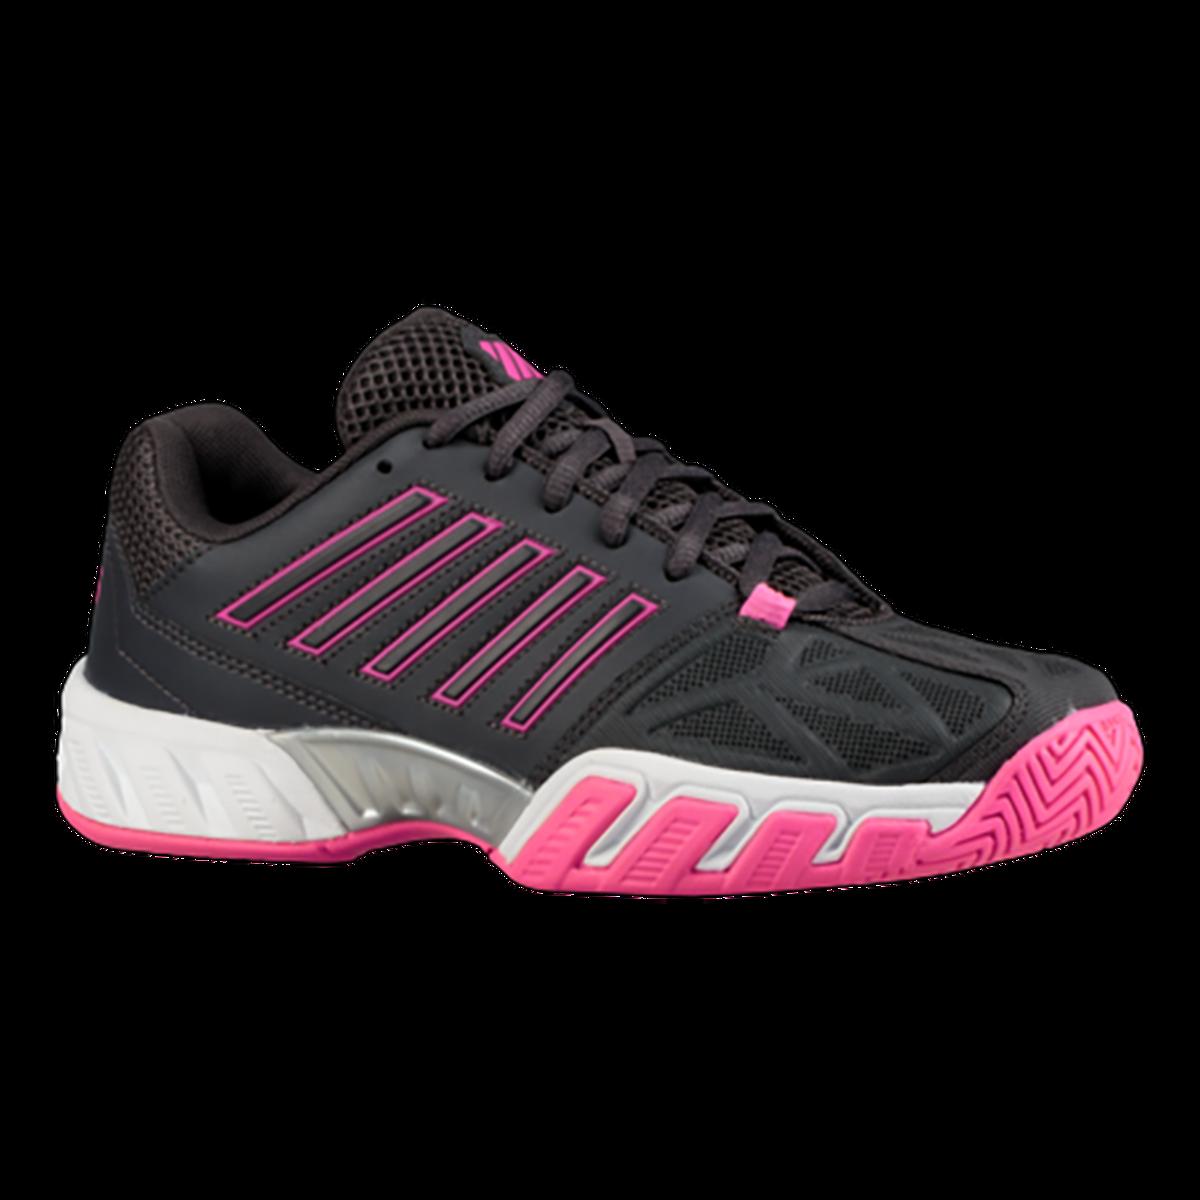 Images. K-Swiss Bigshot Light 3 Women  39 s Tennis Shoe - Black  a0e0b6ed3f8e